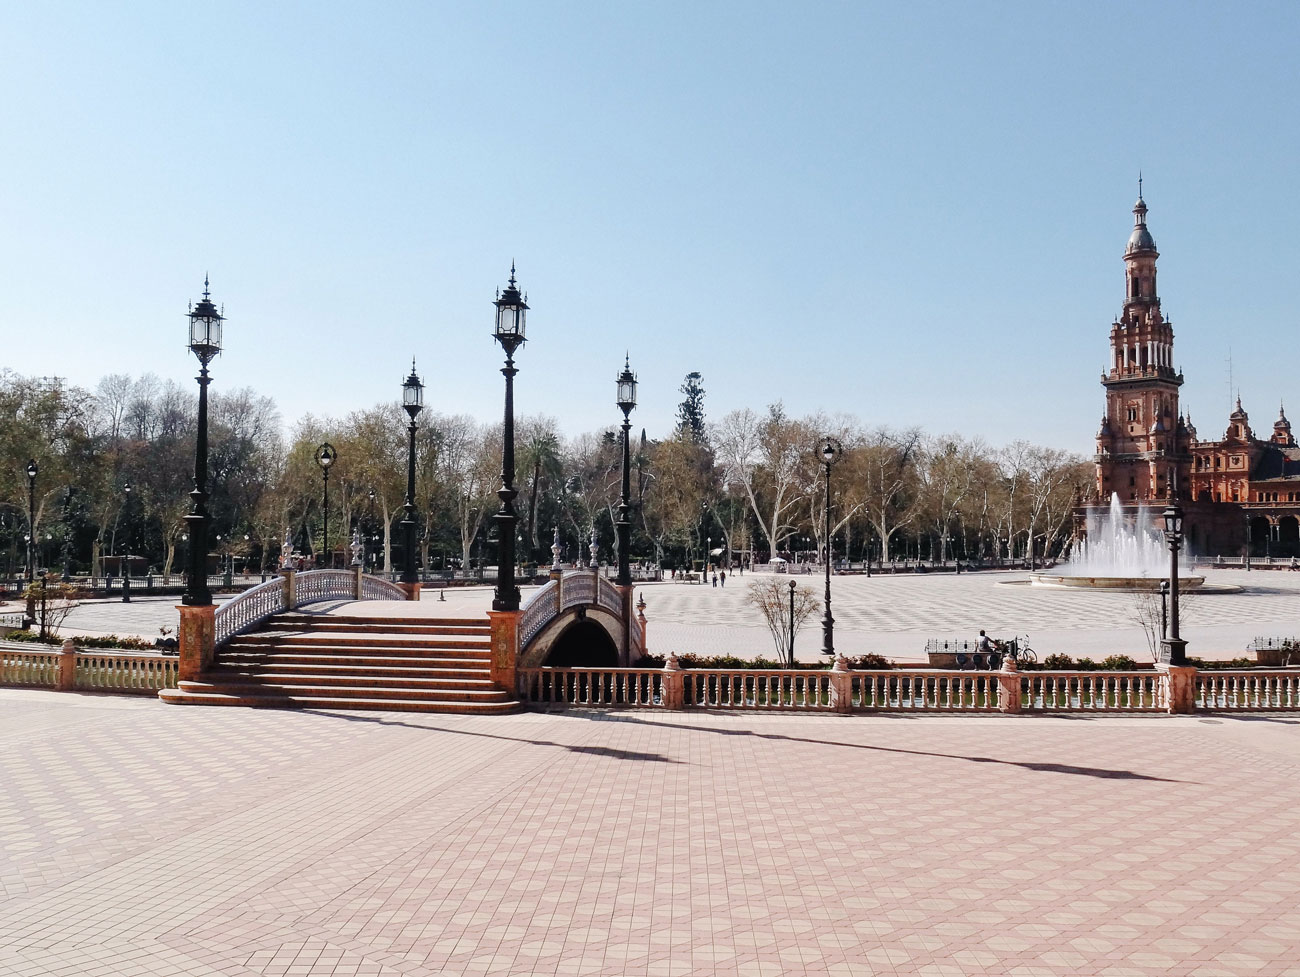 voyage à Séville, plaza españa - hellolaroux.com